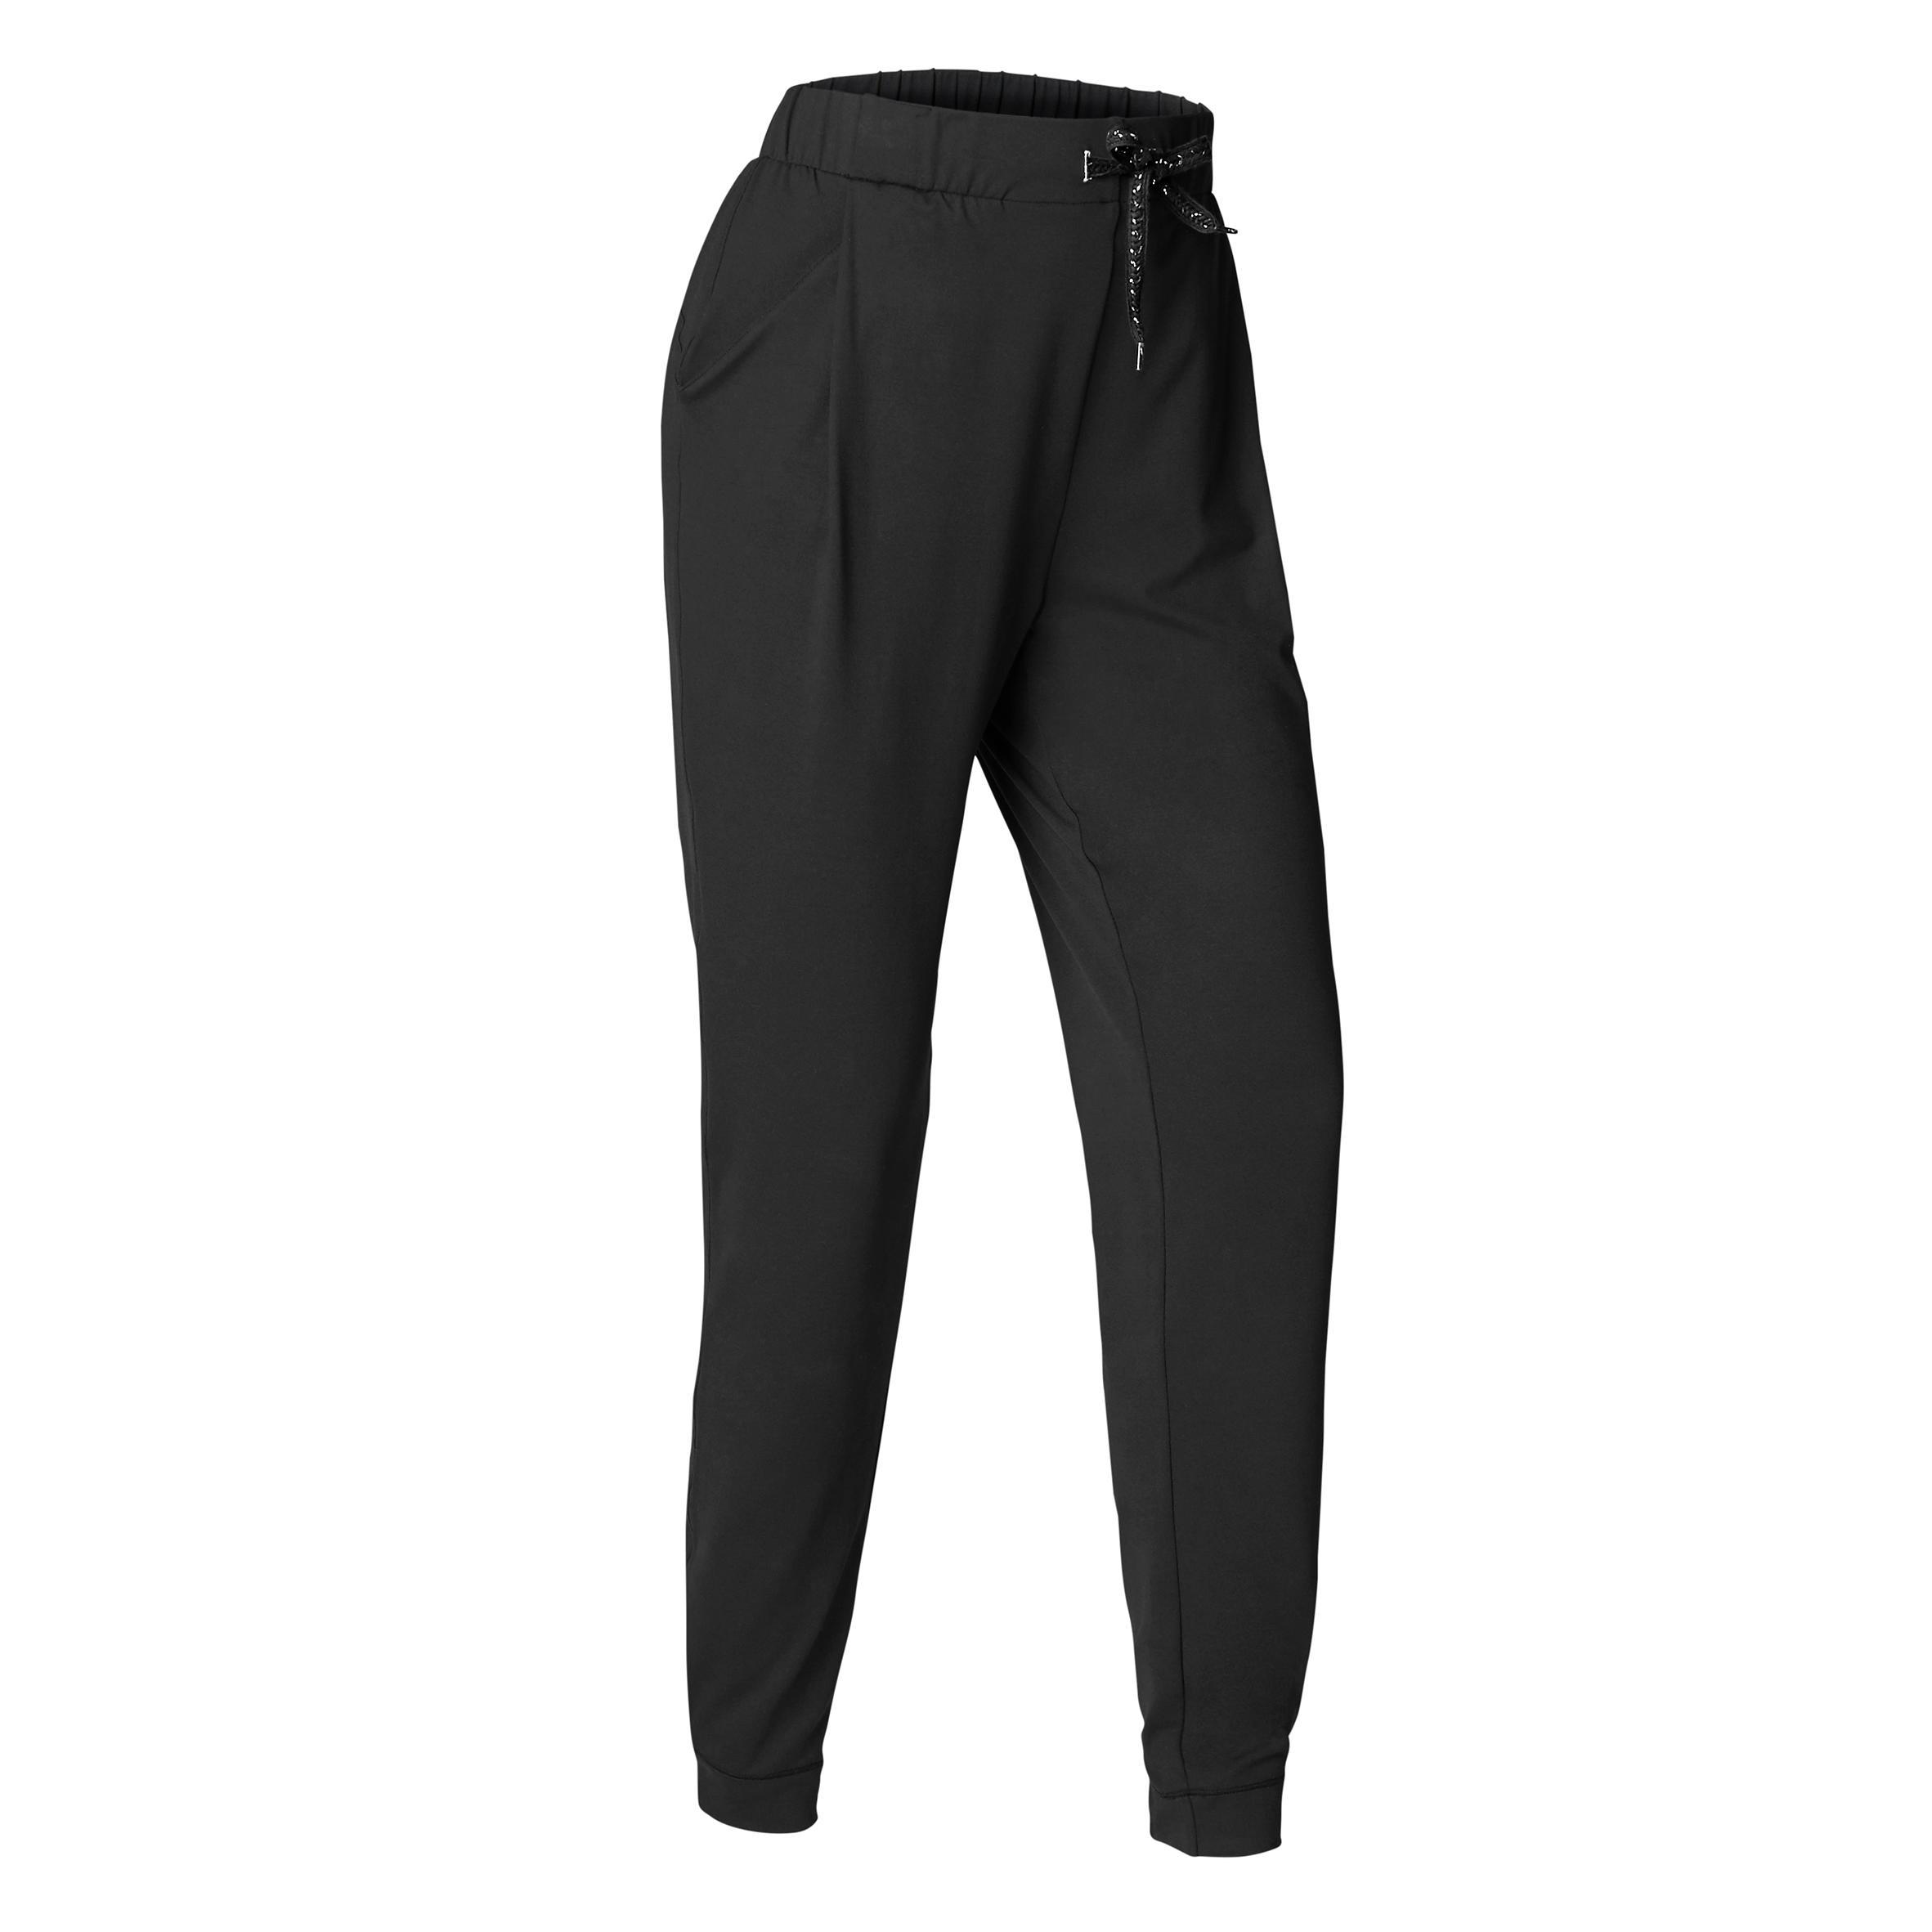 Yogahose Studio Damen schwarz | Sportbekleidung > Sporthosen > Yogahosen | Schwarz | Domyos